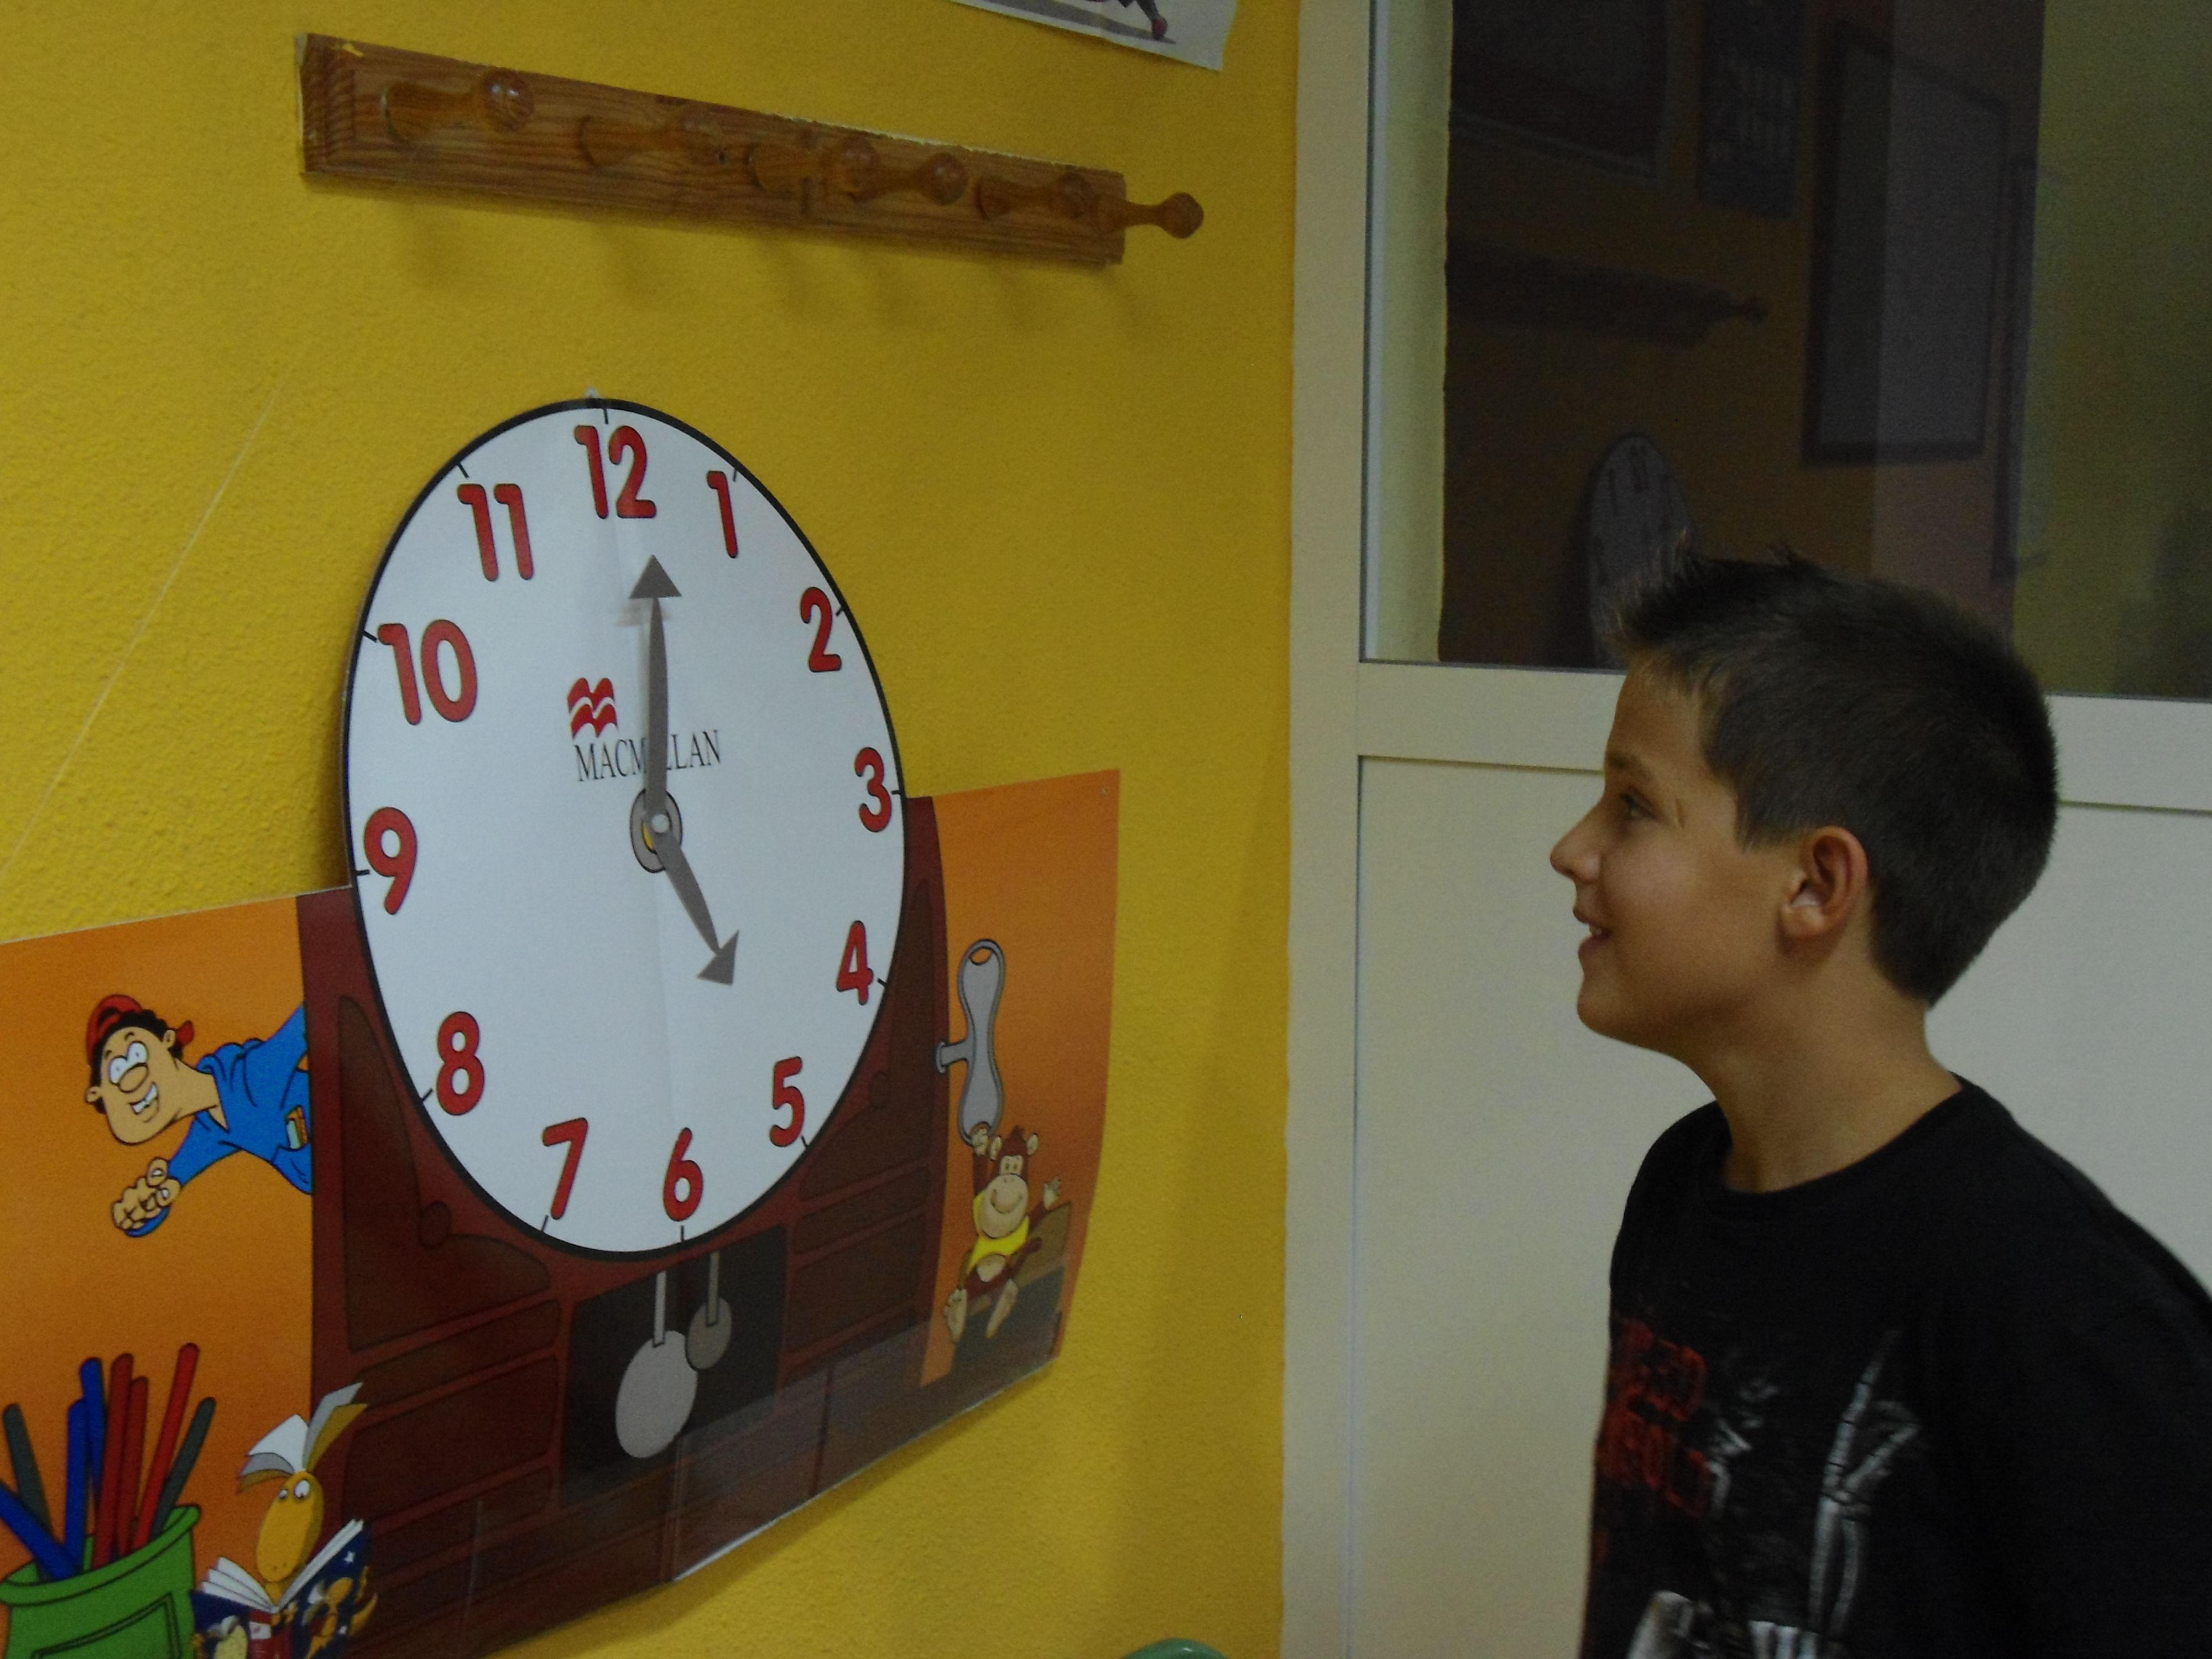 Foto 34 de Academias de idiomas en Moncada | Centre d'Estudis Etnies